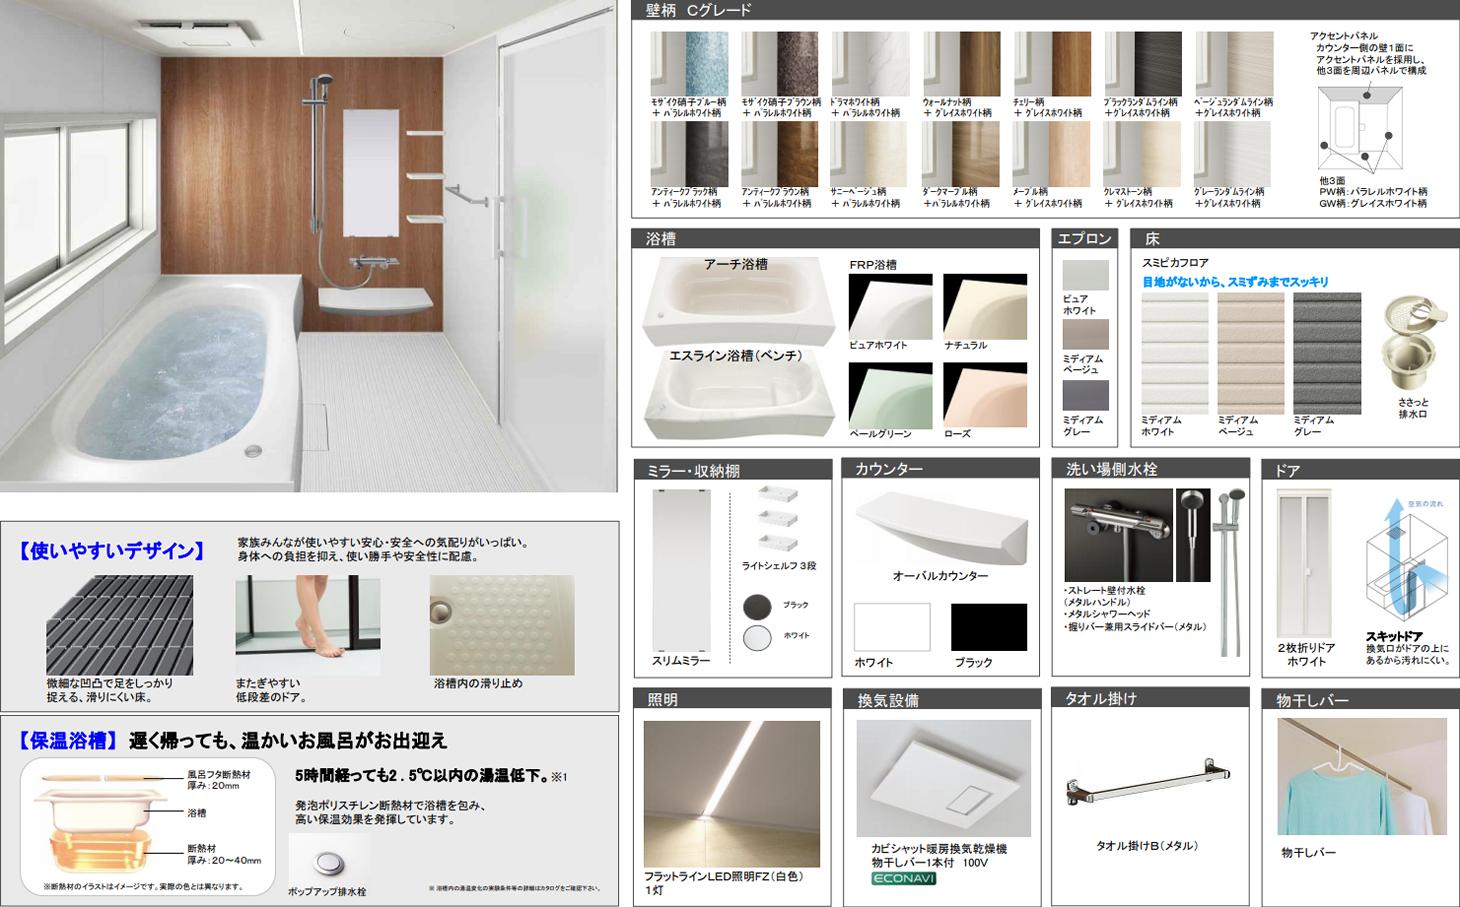 Panasonic バスルーム FZ 1616サイズ